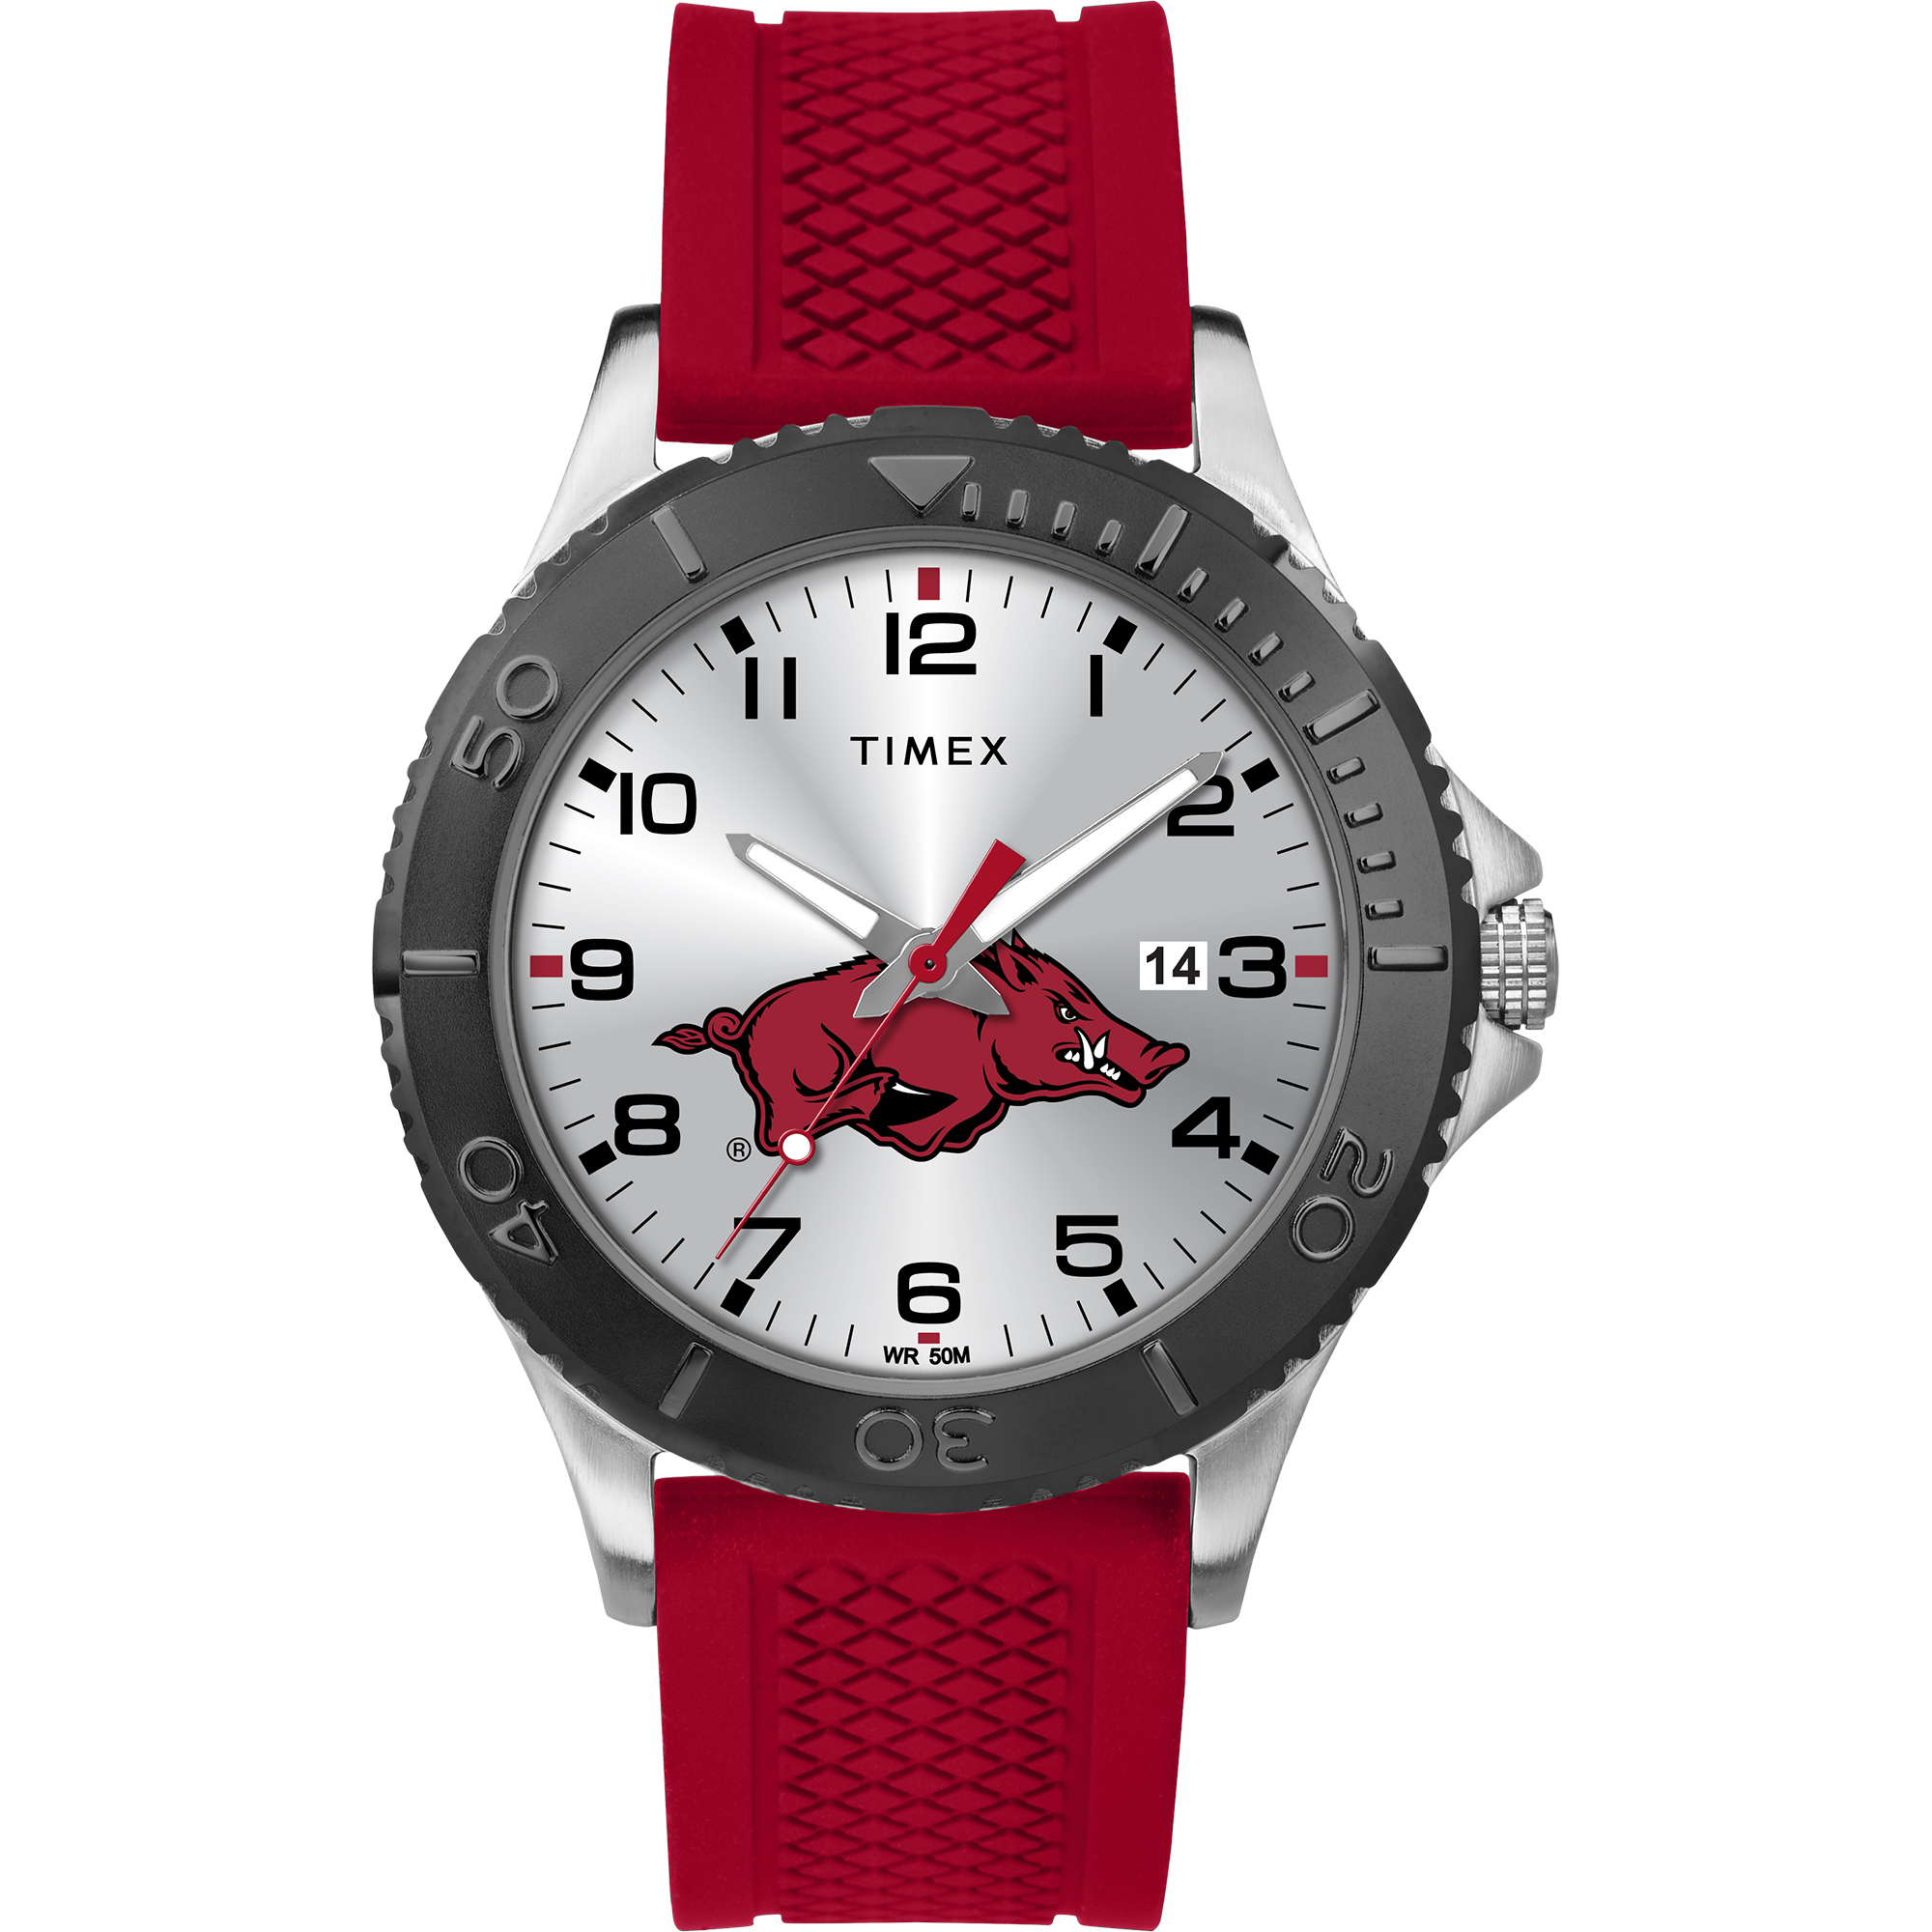 Timex - NCAA Tribute Collection Gamer Red Men's Watch, University of Arkansas Razorbacks